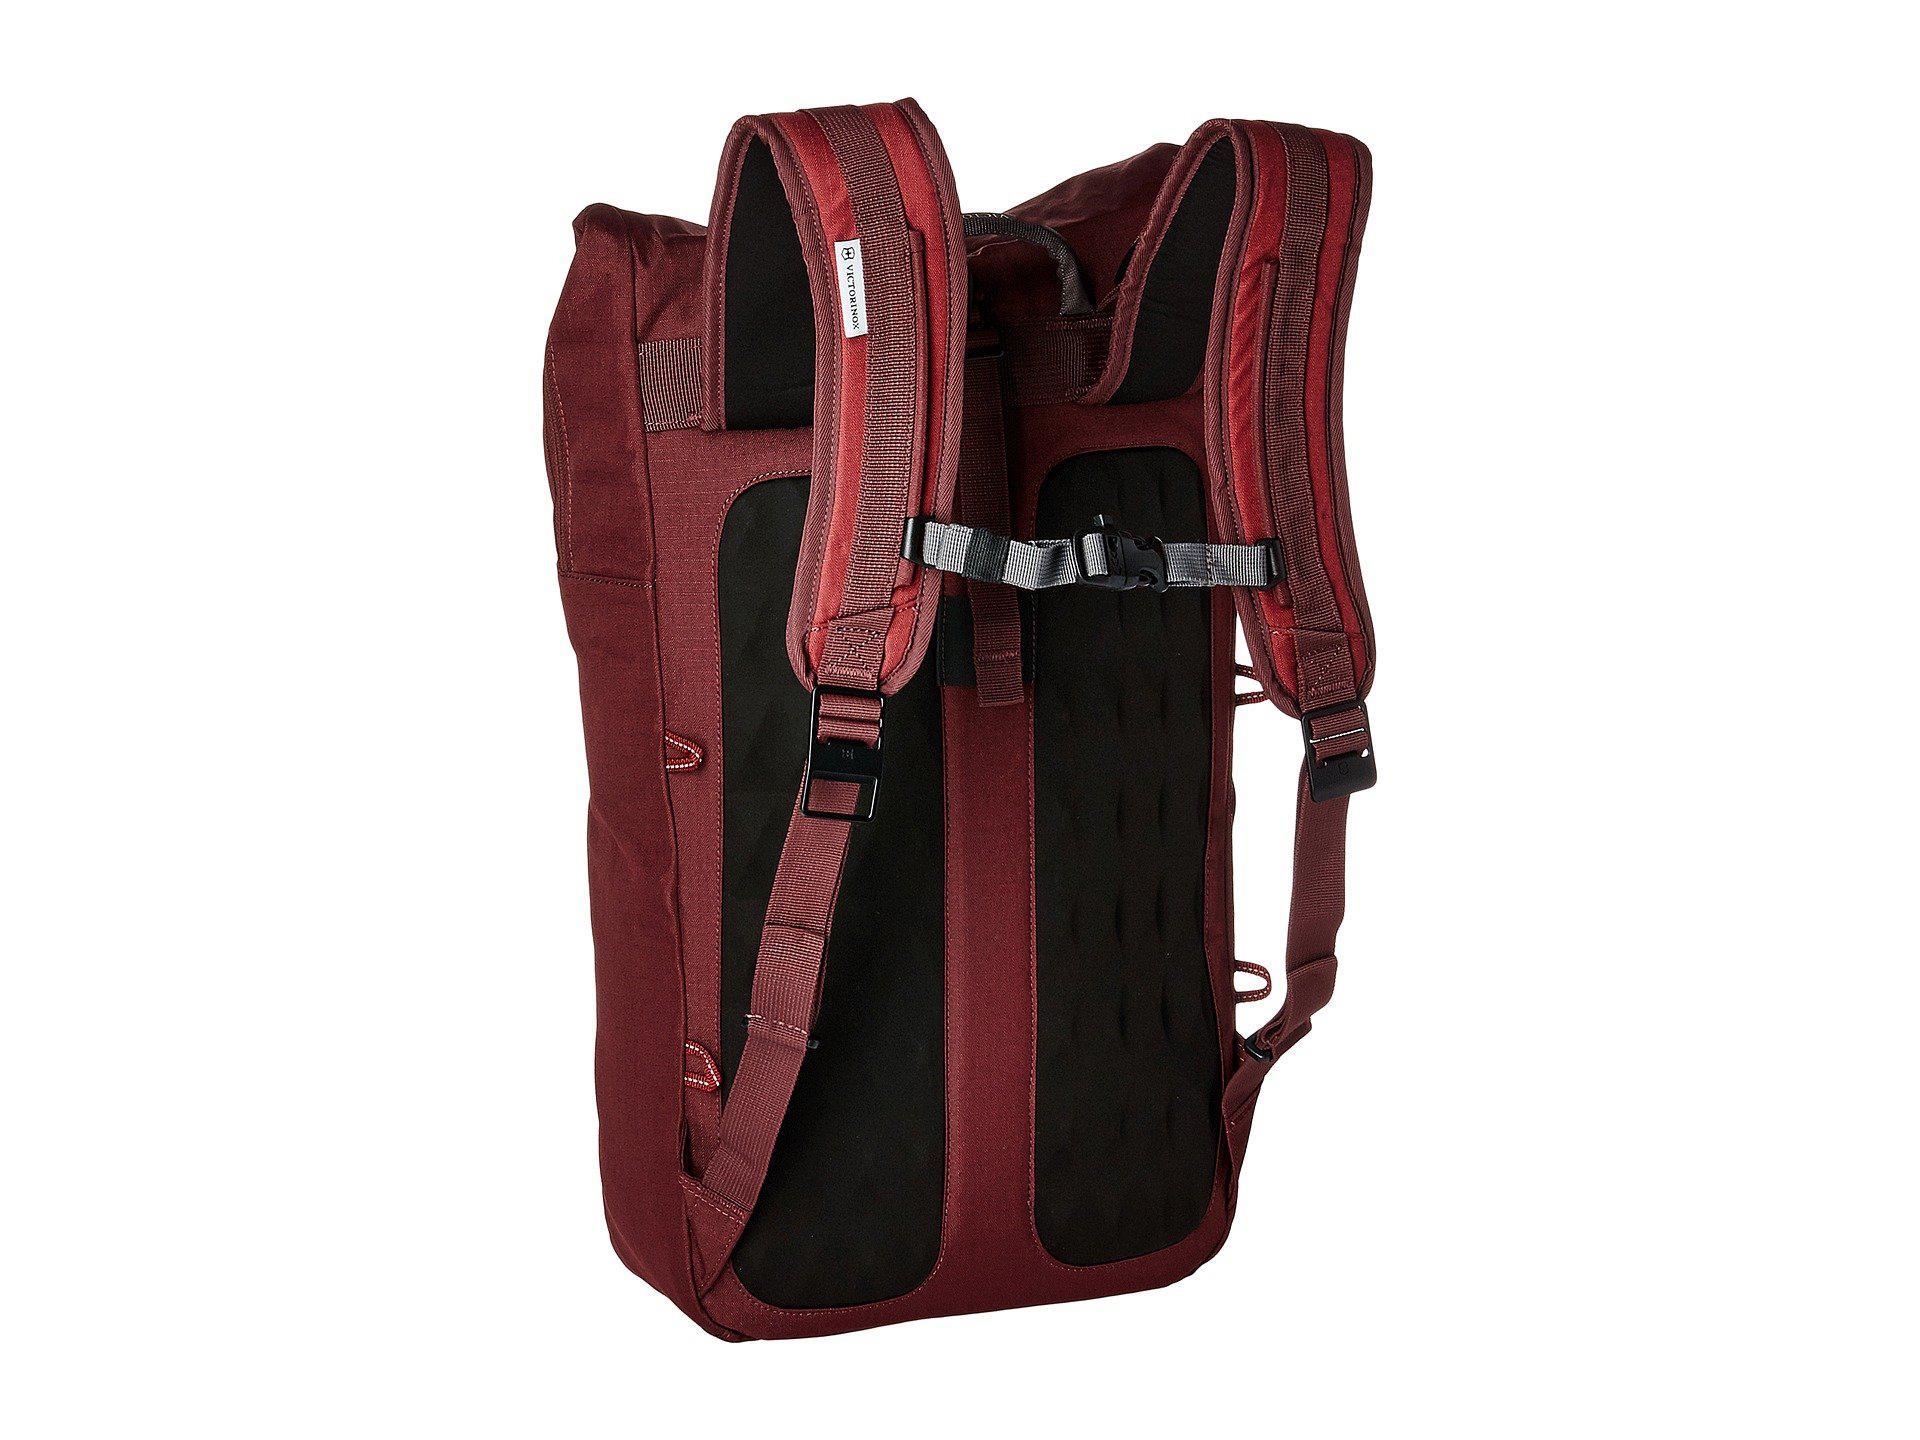 d0d533bb4f91 Victorinox - Multicolor Altmont Active Deluxe Duffel Laptop Backpack  (burgundy) Backpack Bags for Men. View fullscreen